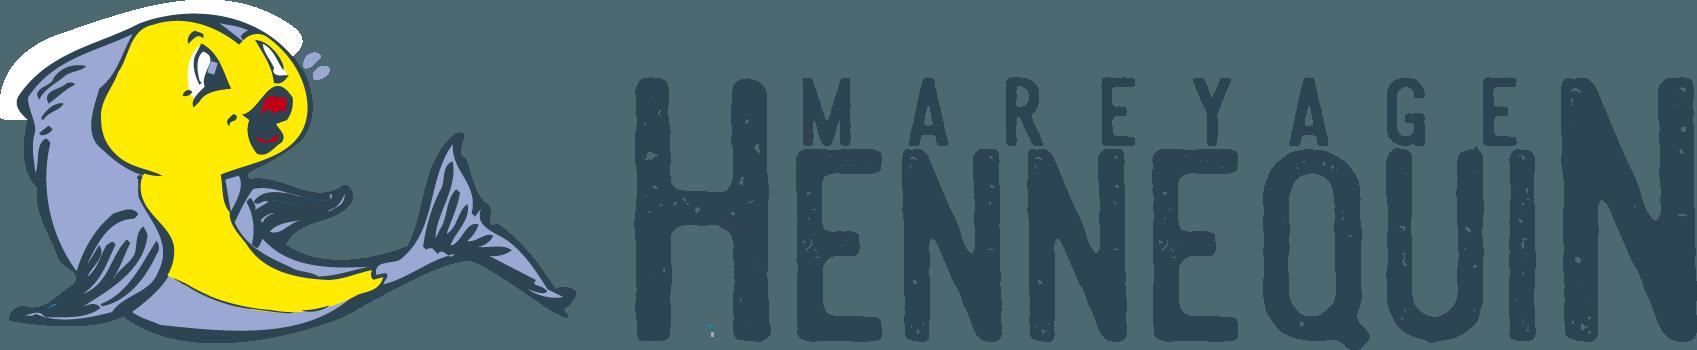 Mareyage Hennequin